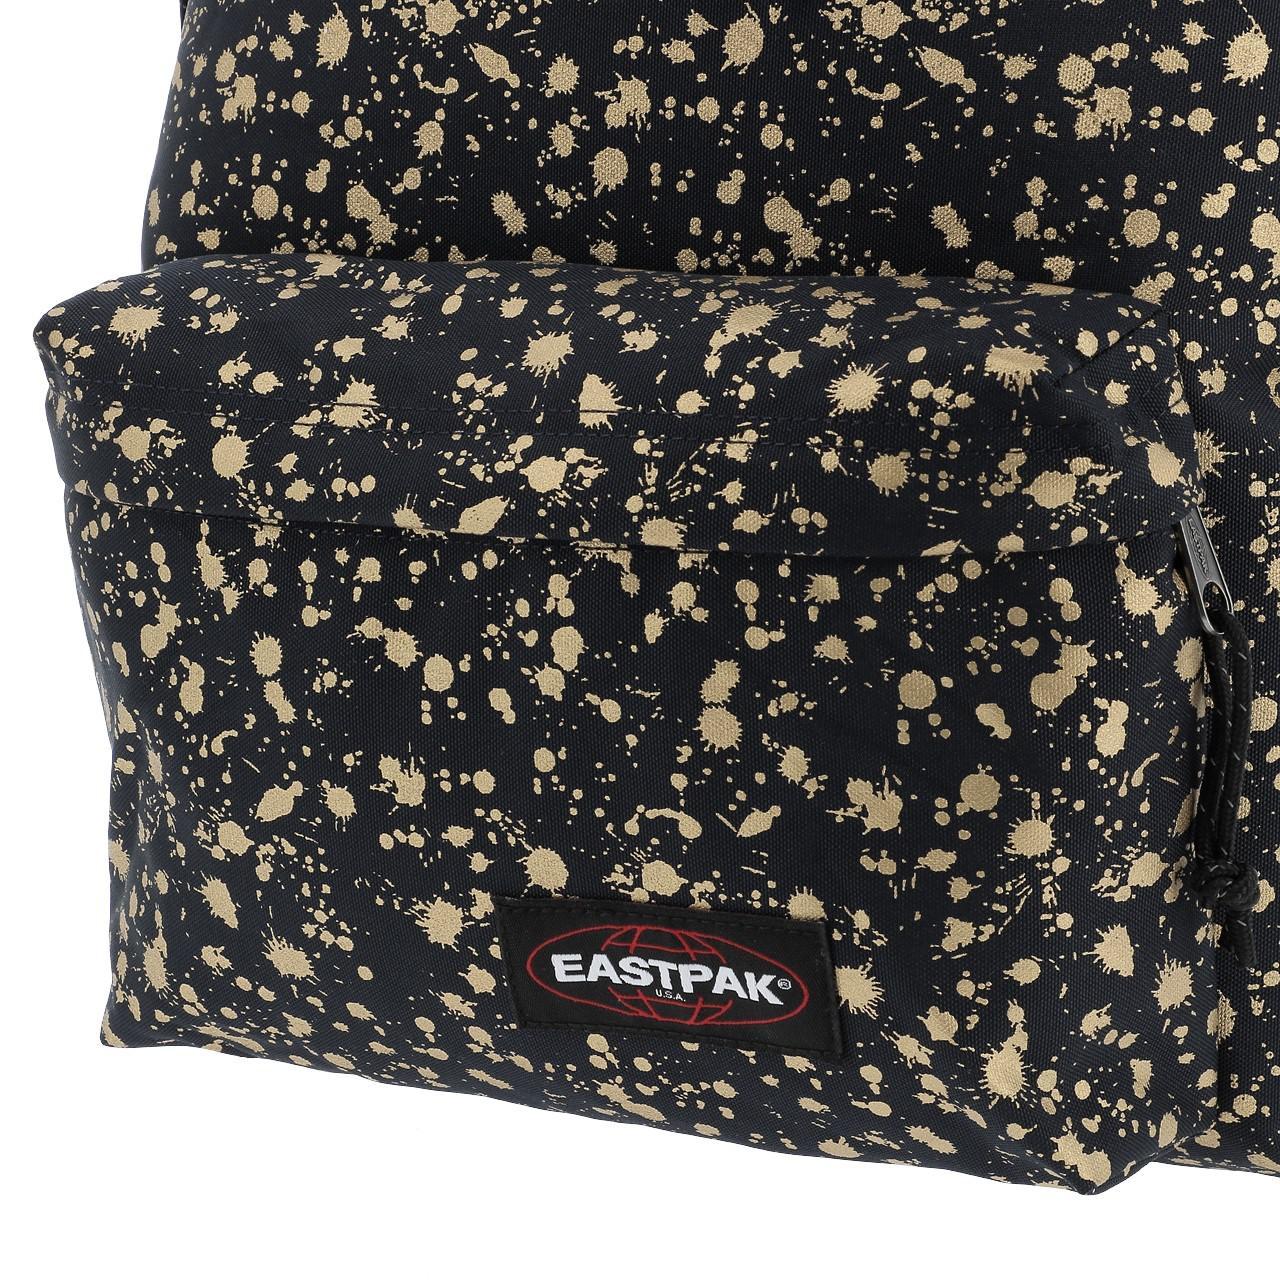 Sac-a-dos-mini-Eastpak-Orbit-gold-mist-black-Noir-70337-Neuf miniature 3